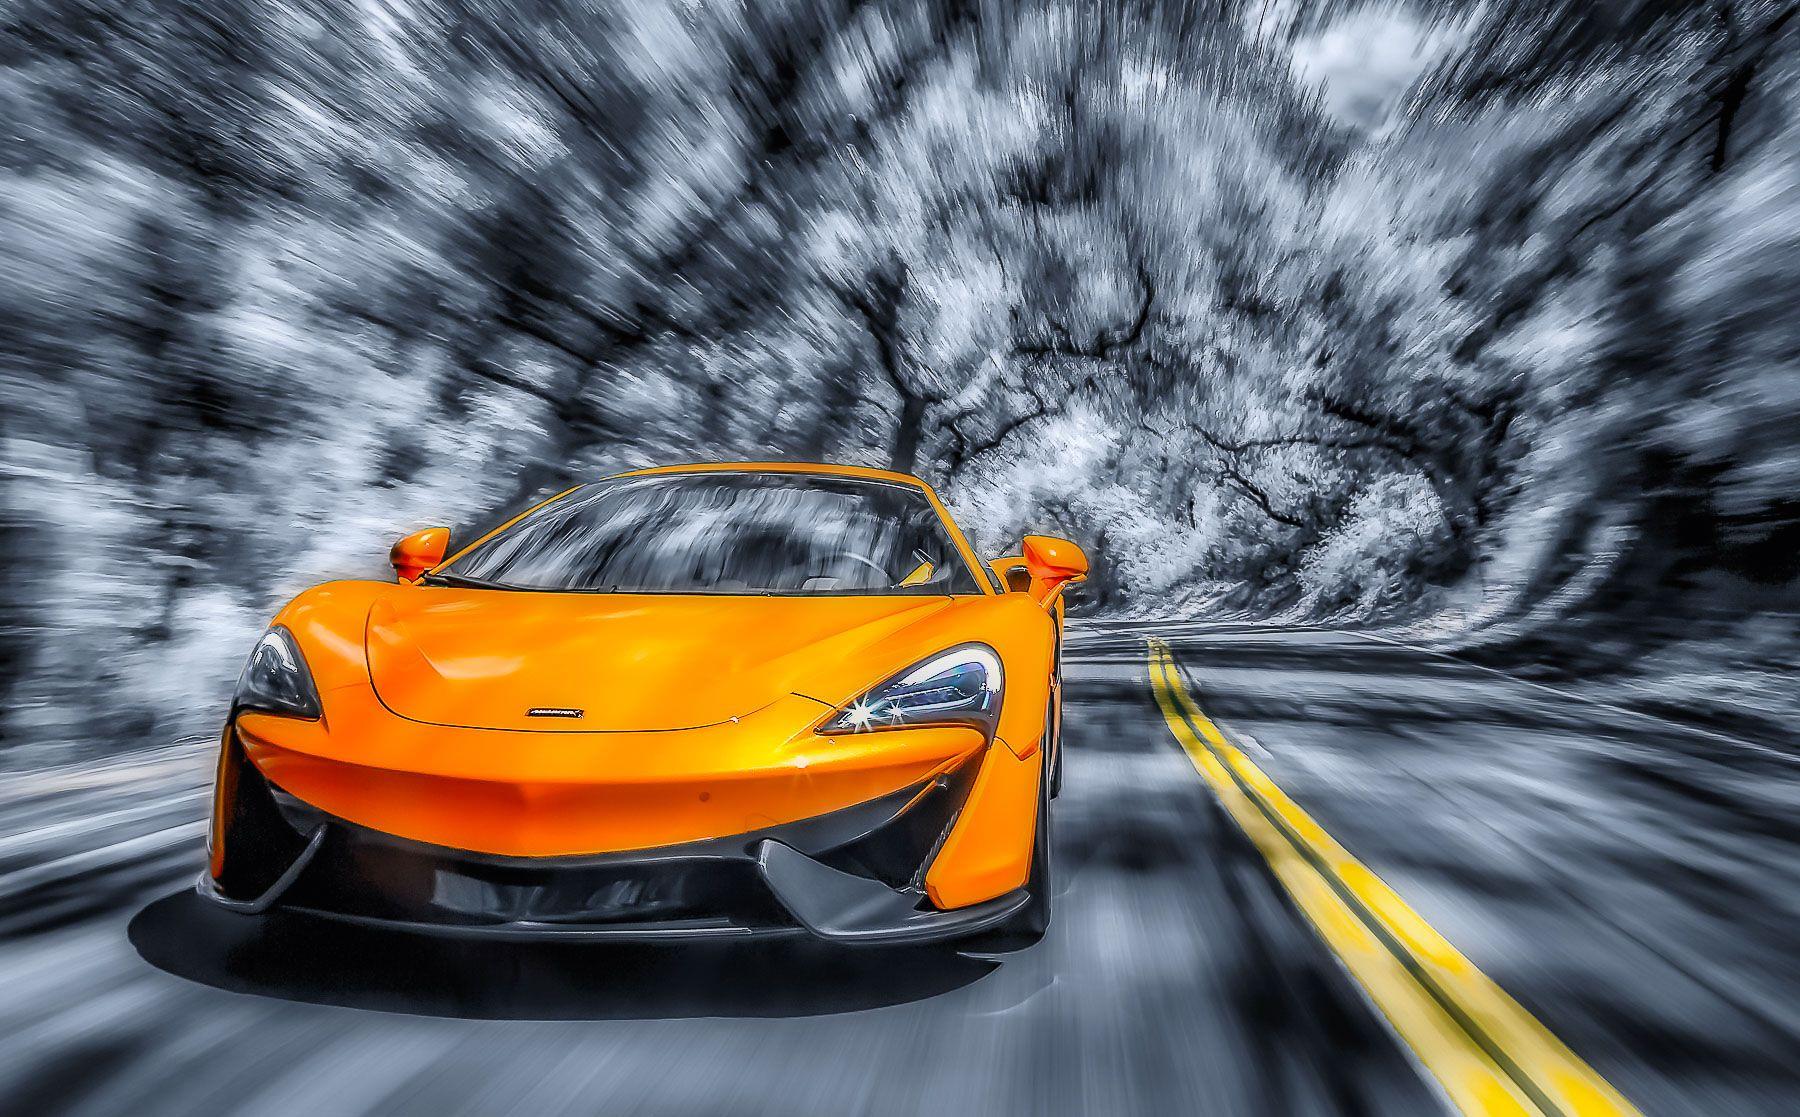 McLaren 570S-9912-infra.jpg